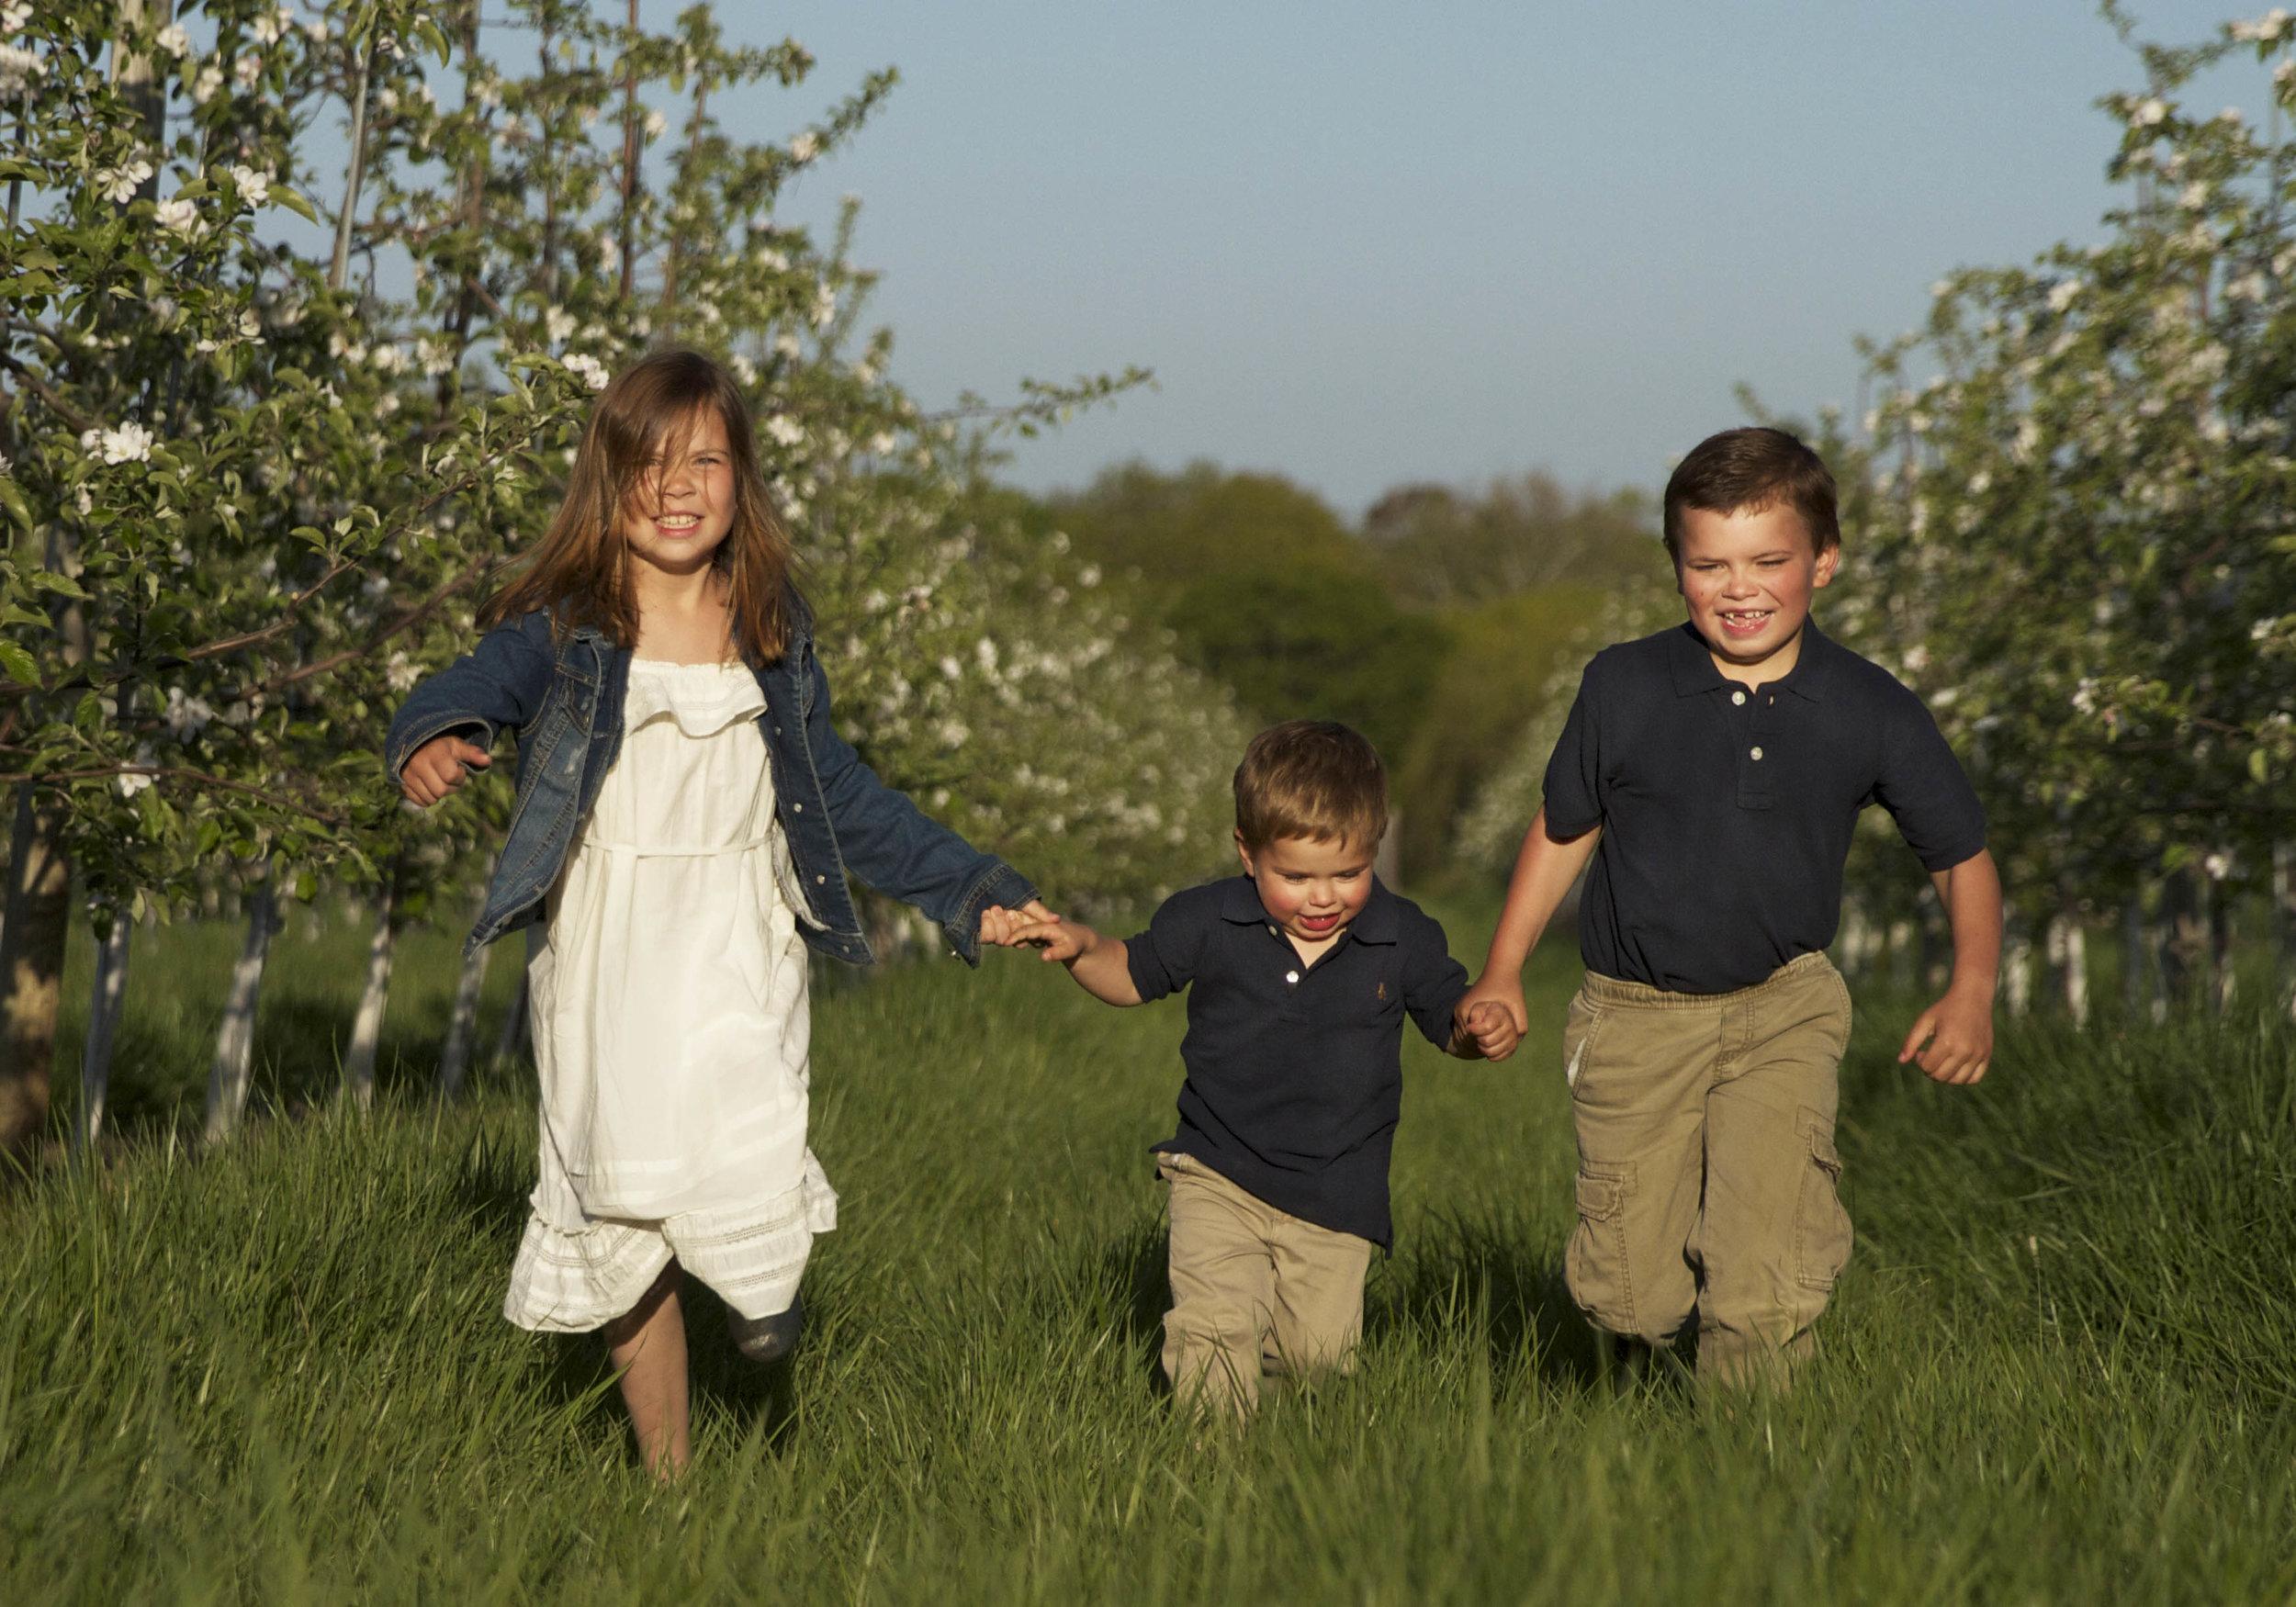 Kids in Orchard.jpg